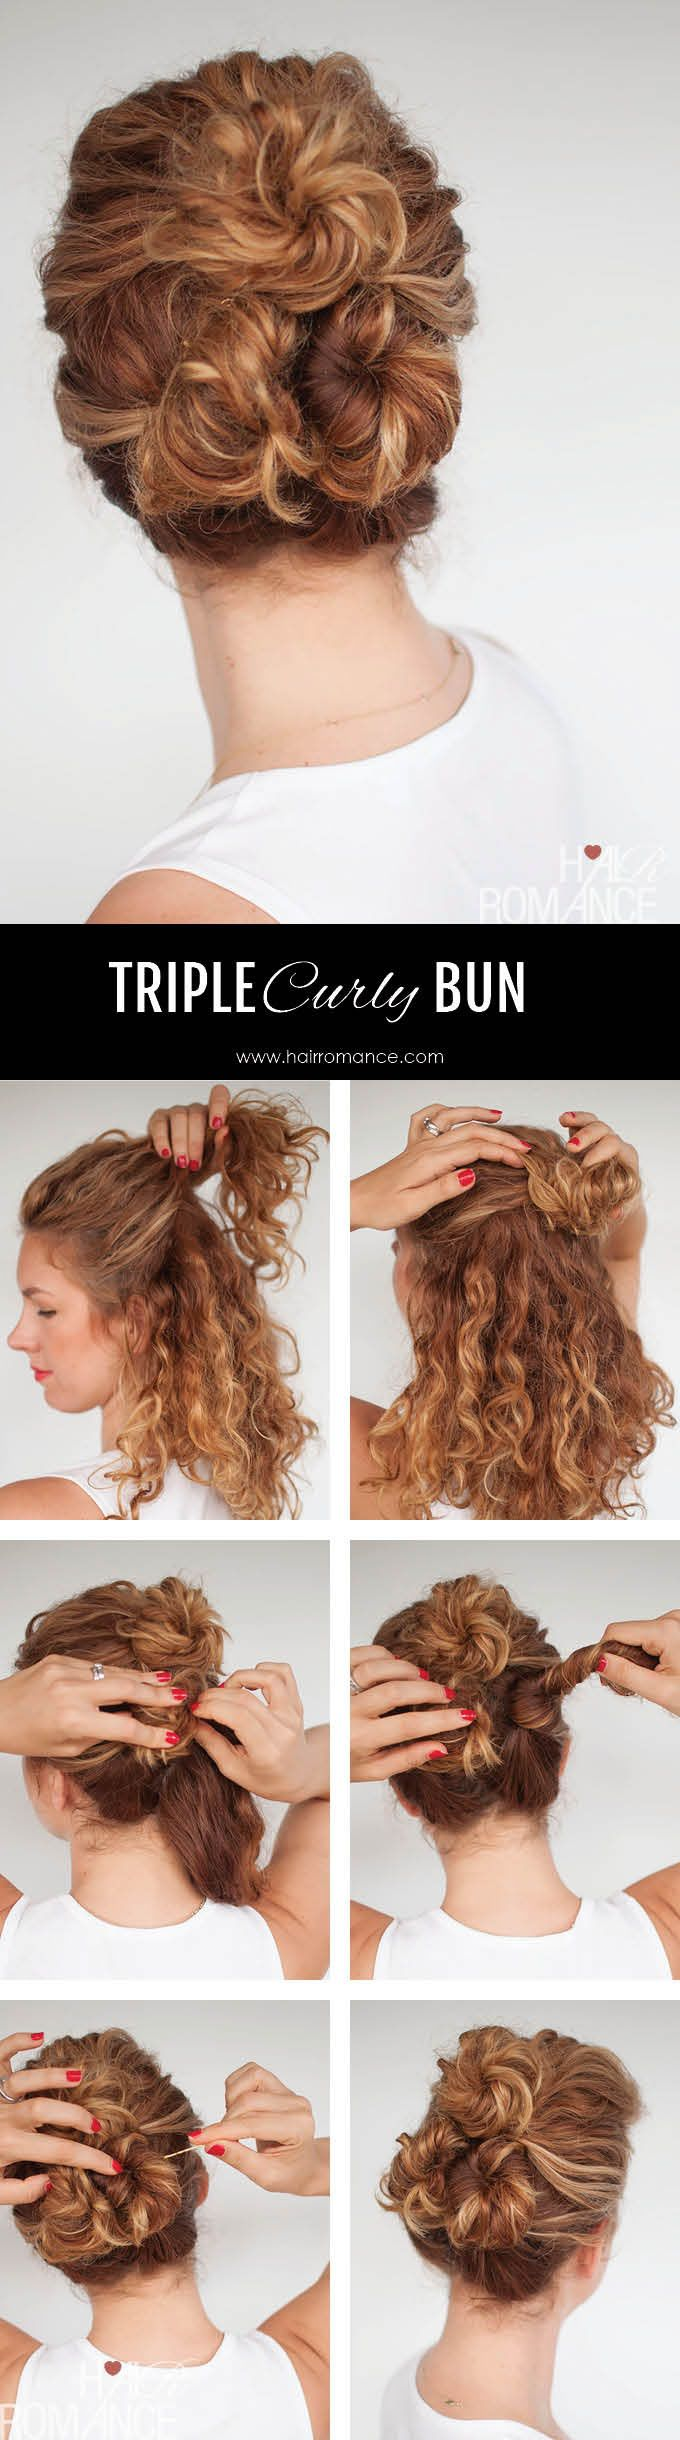 triple curly buns